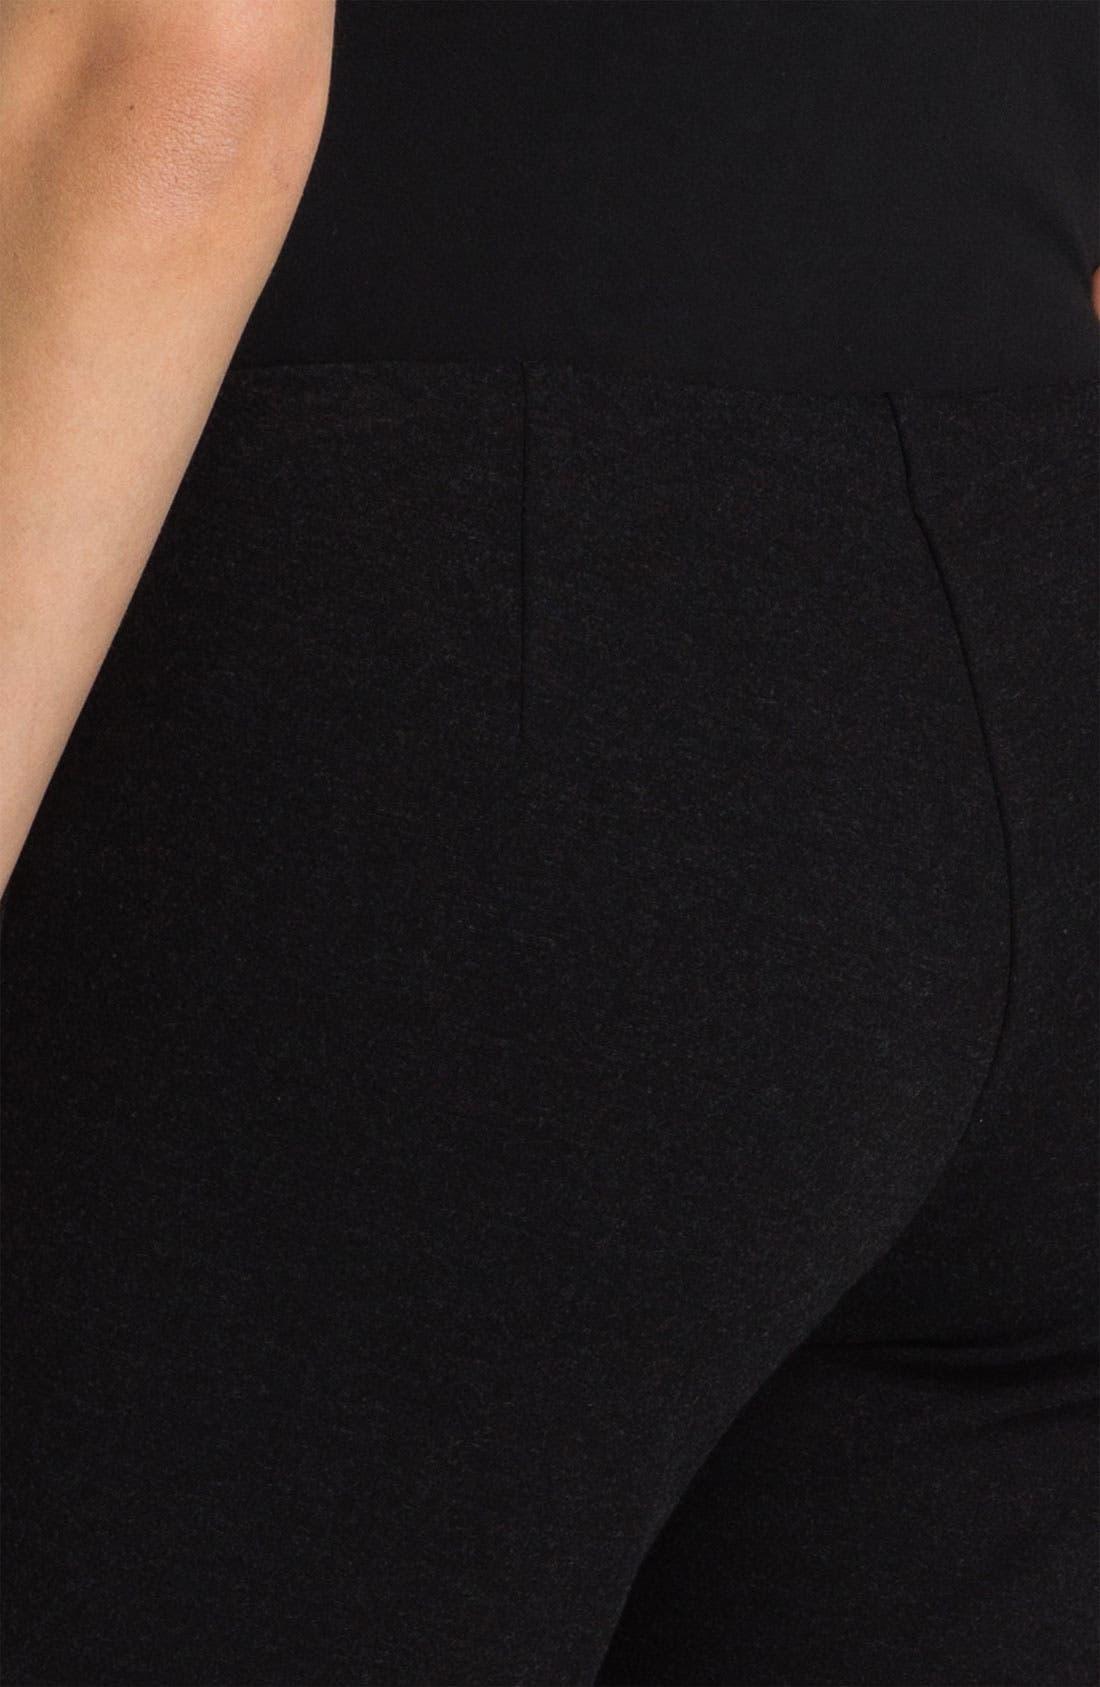 Alternate Image 3  - Eileen Fisher Slim Ponte Knit Pants (Petite)